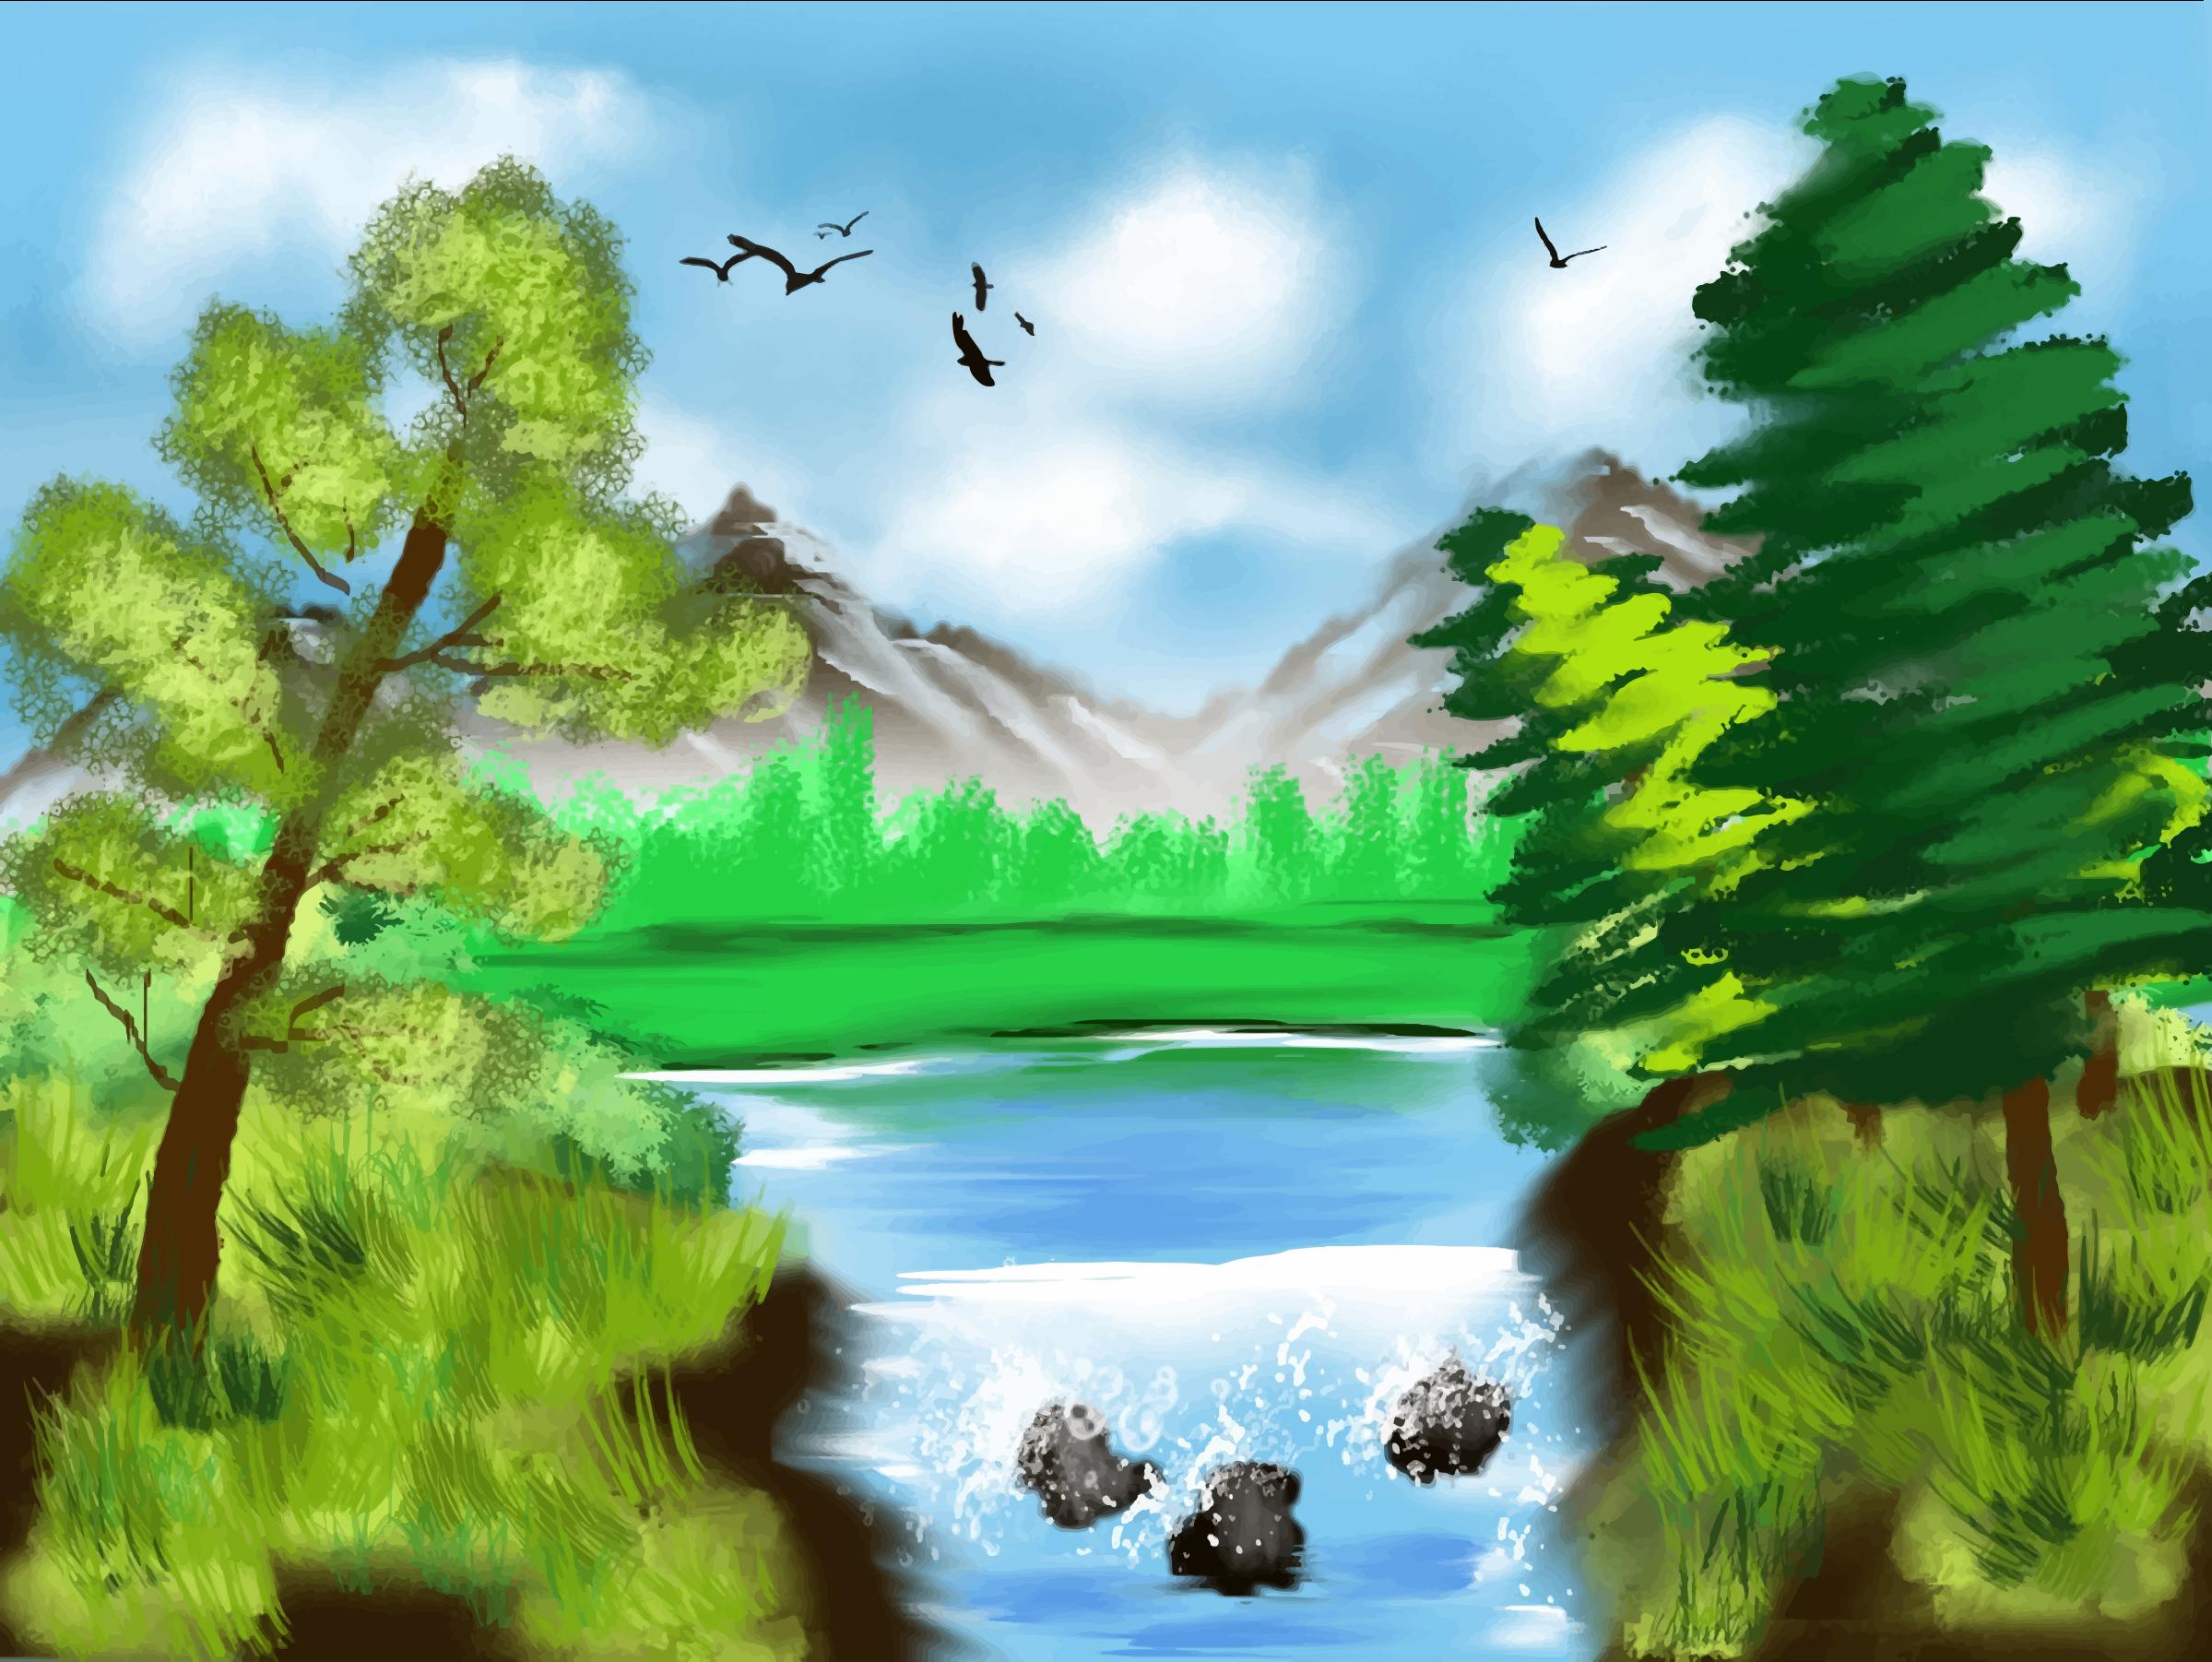 Scenery clipart lake #11